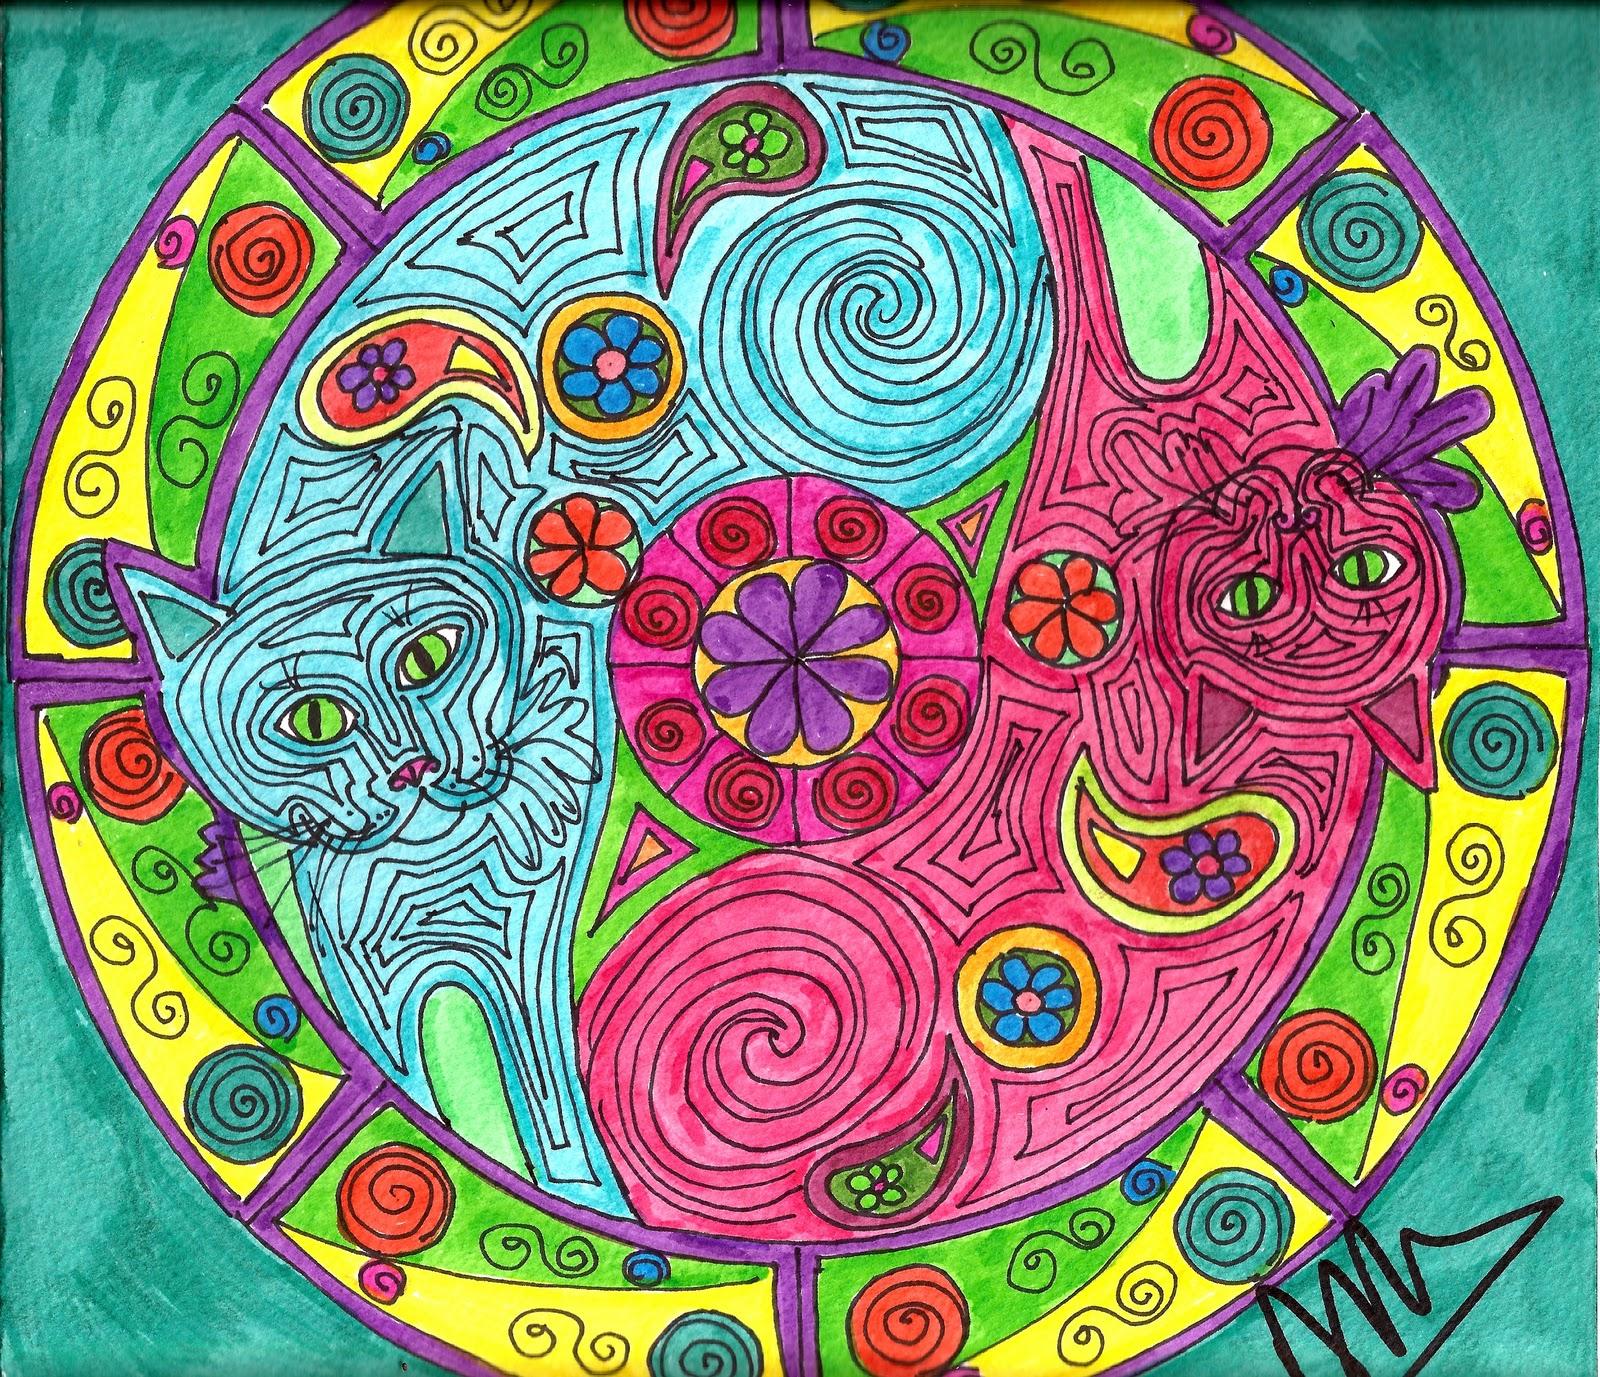 adriana azzolina pinturas mandala gatuna